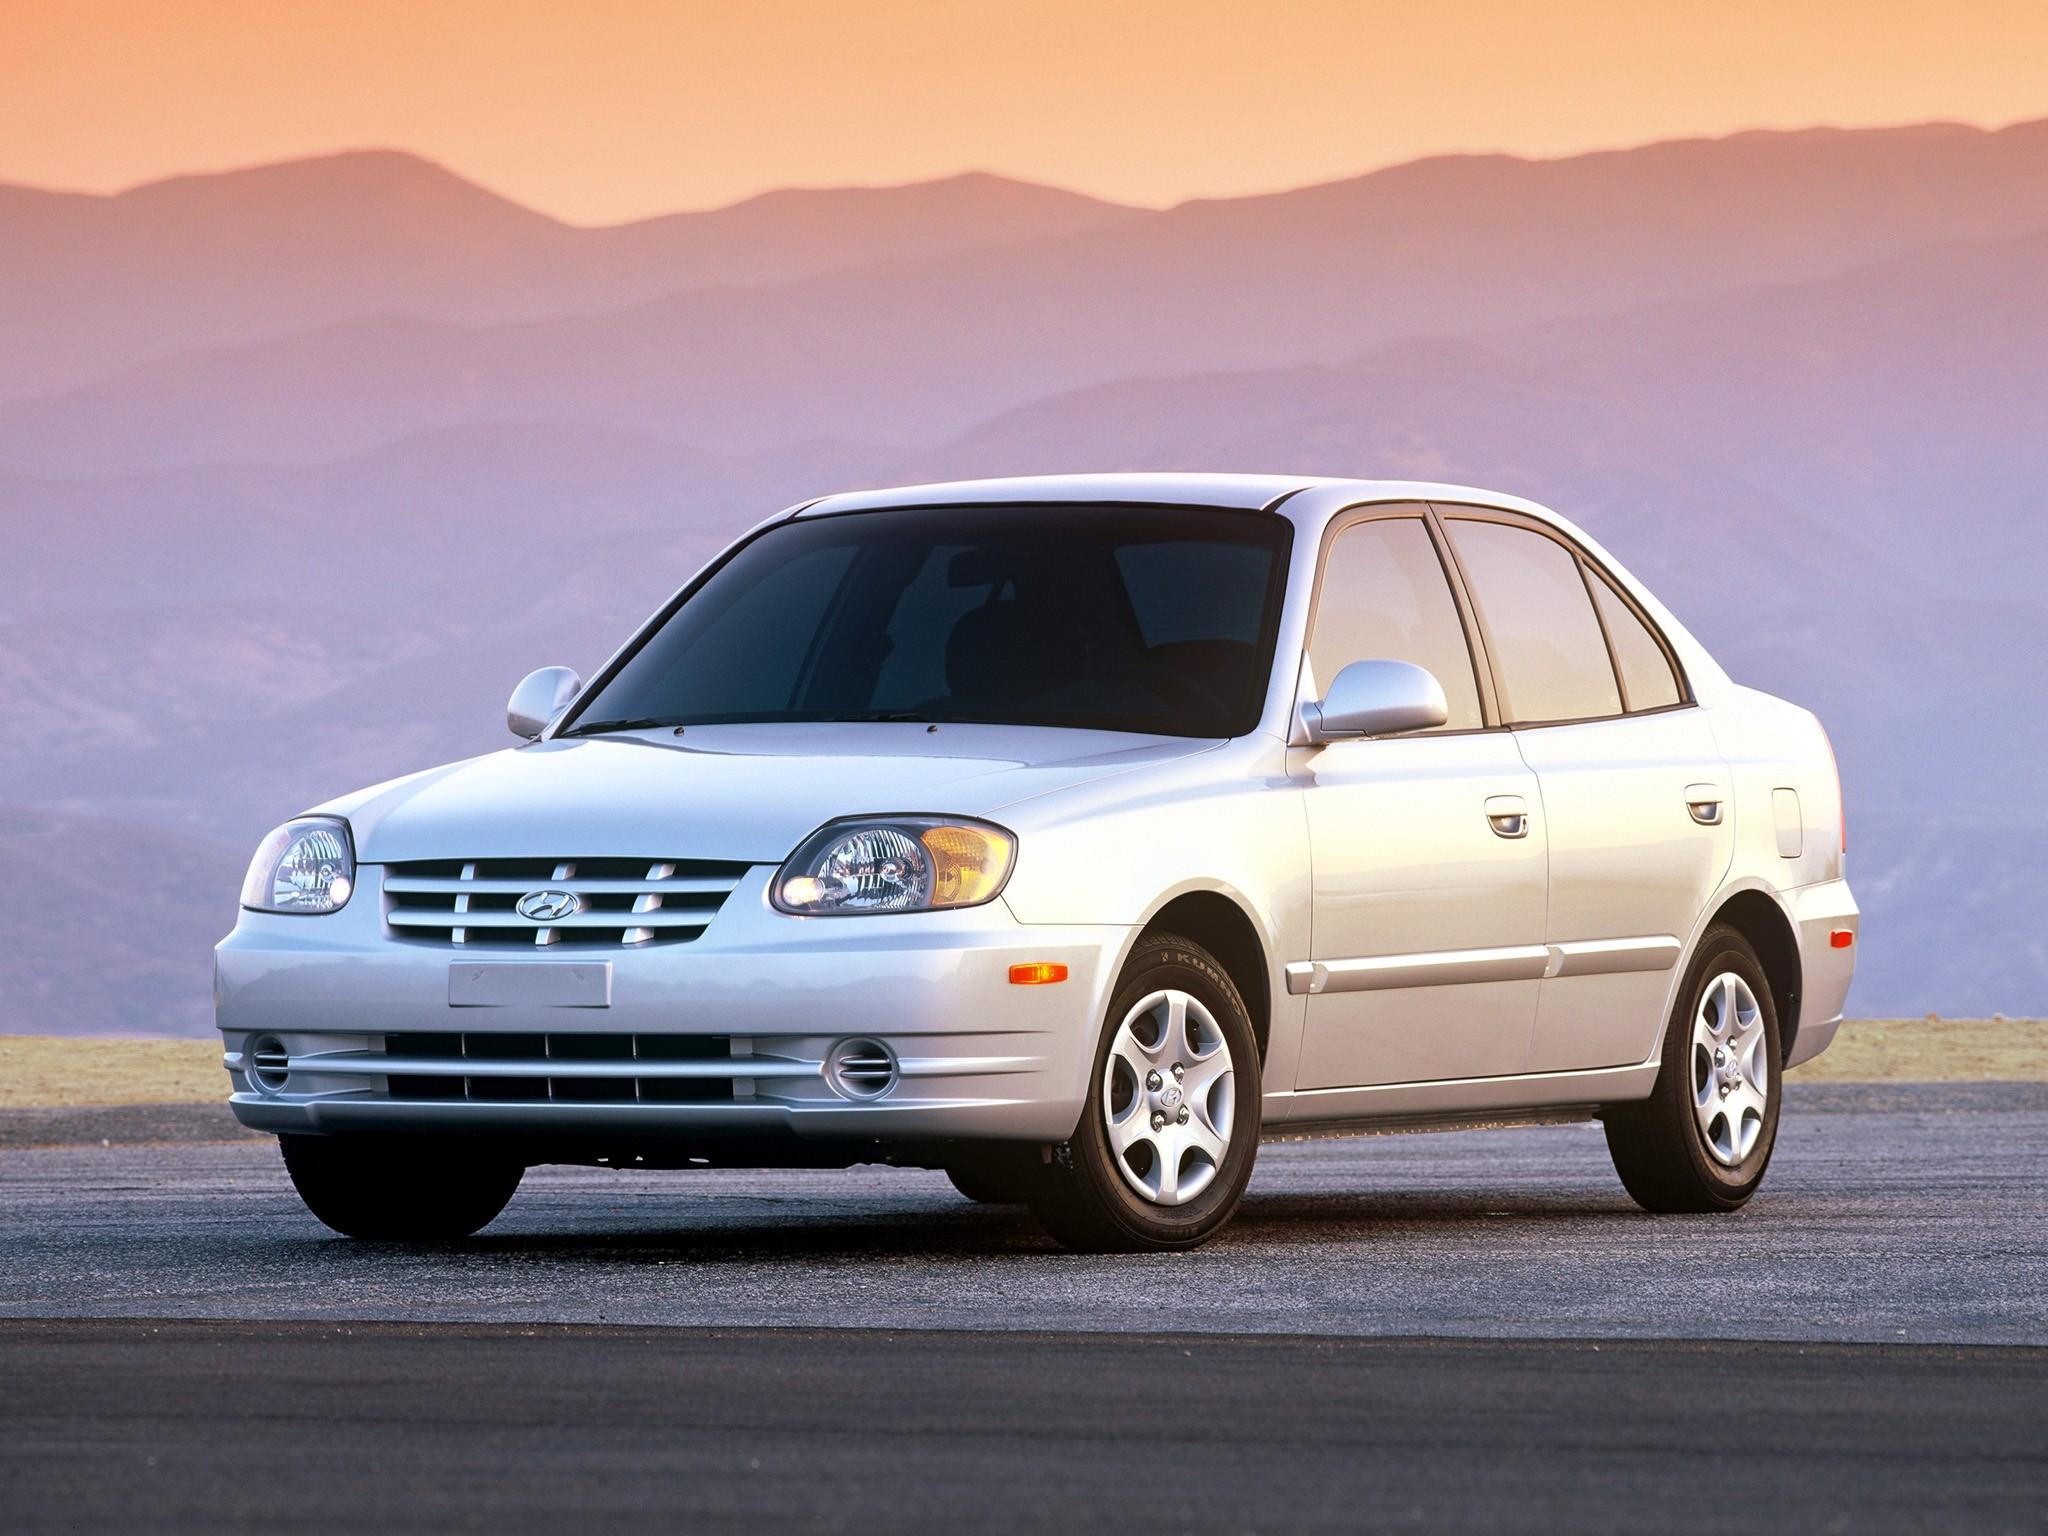 Hyundai Accent Hatchback >> HYUNDAI Accent 4 Doors specs - 2003, 2004, 2005, 2006 ...